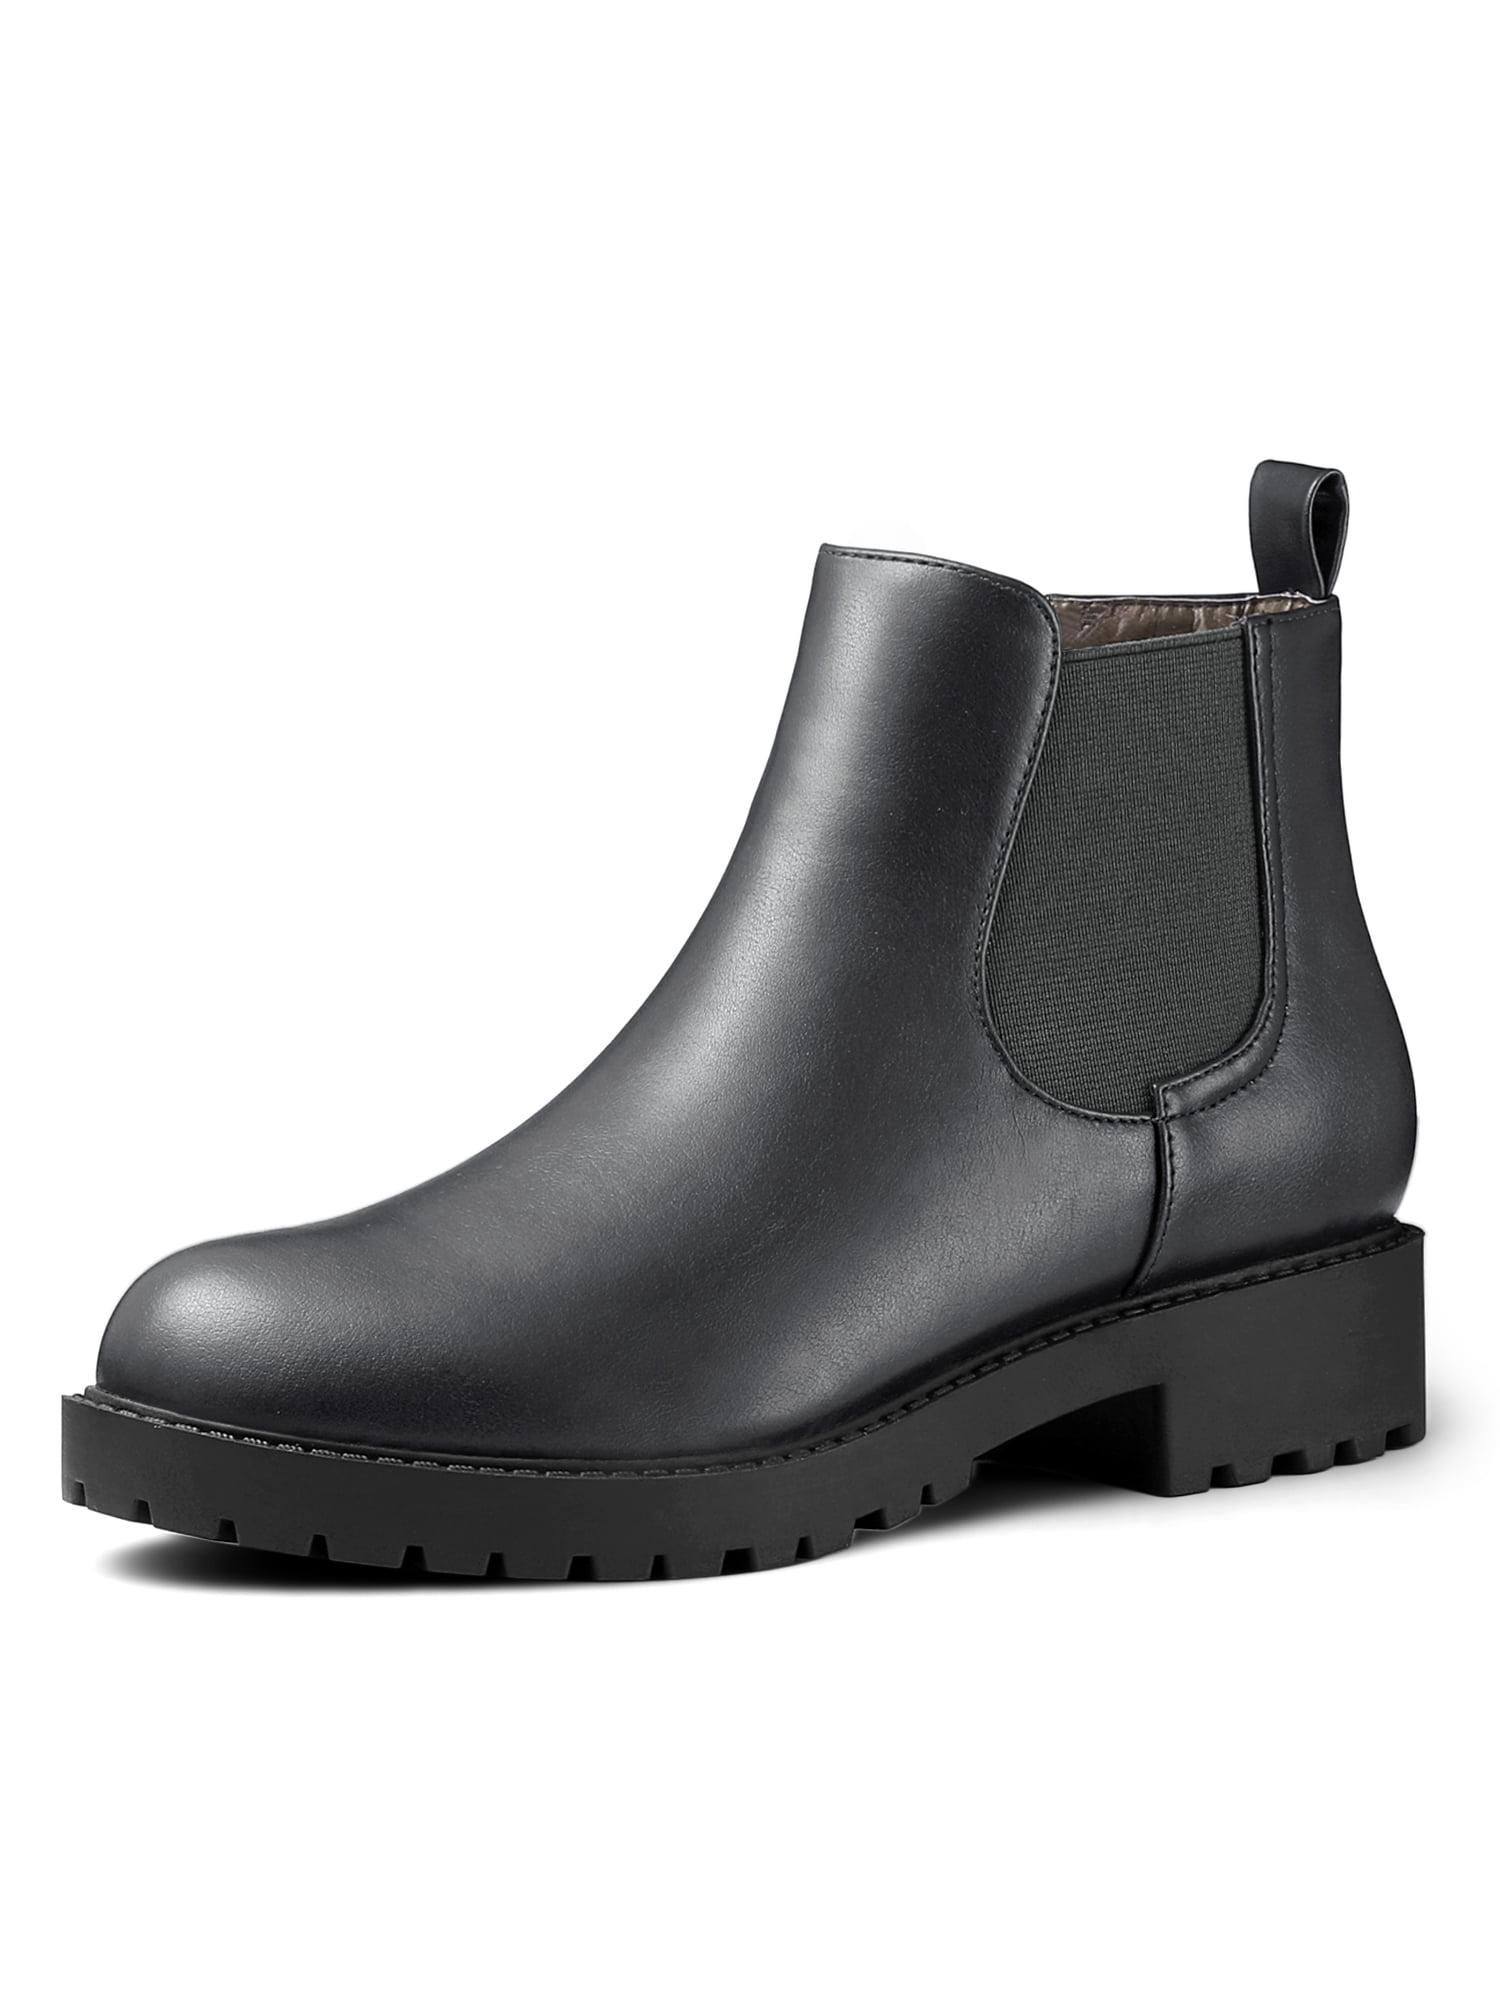 Unique Bargains Women's Round Toe Chelsea Low Heel Ankle Boots Gray (Size 9)